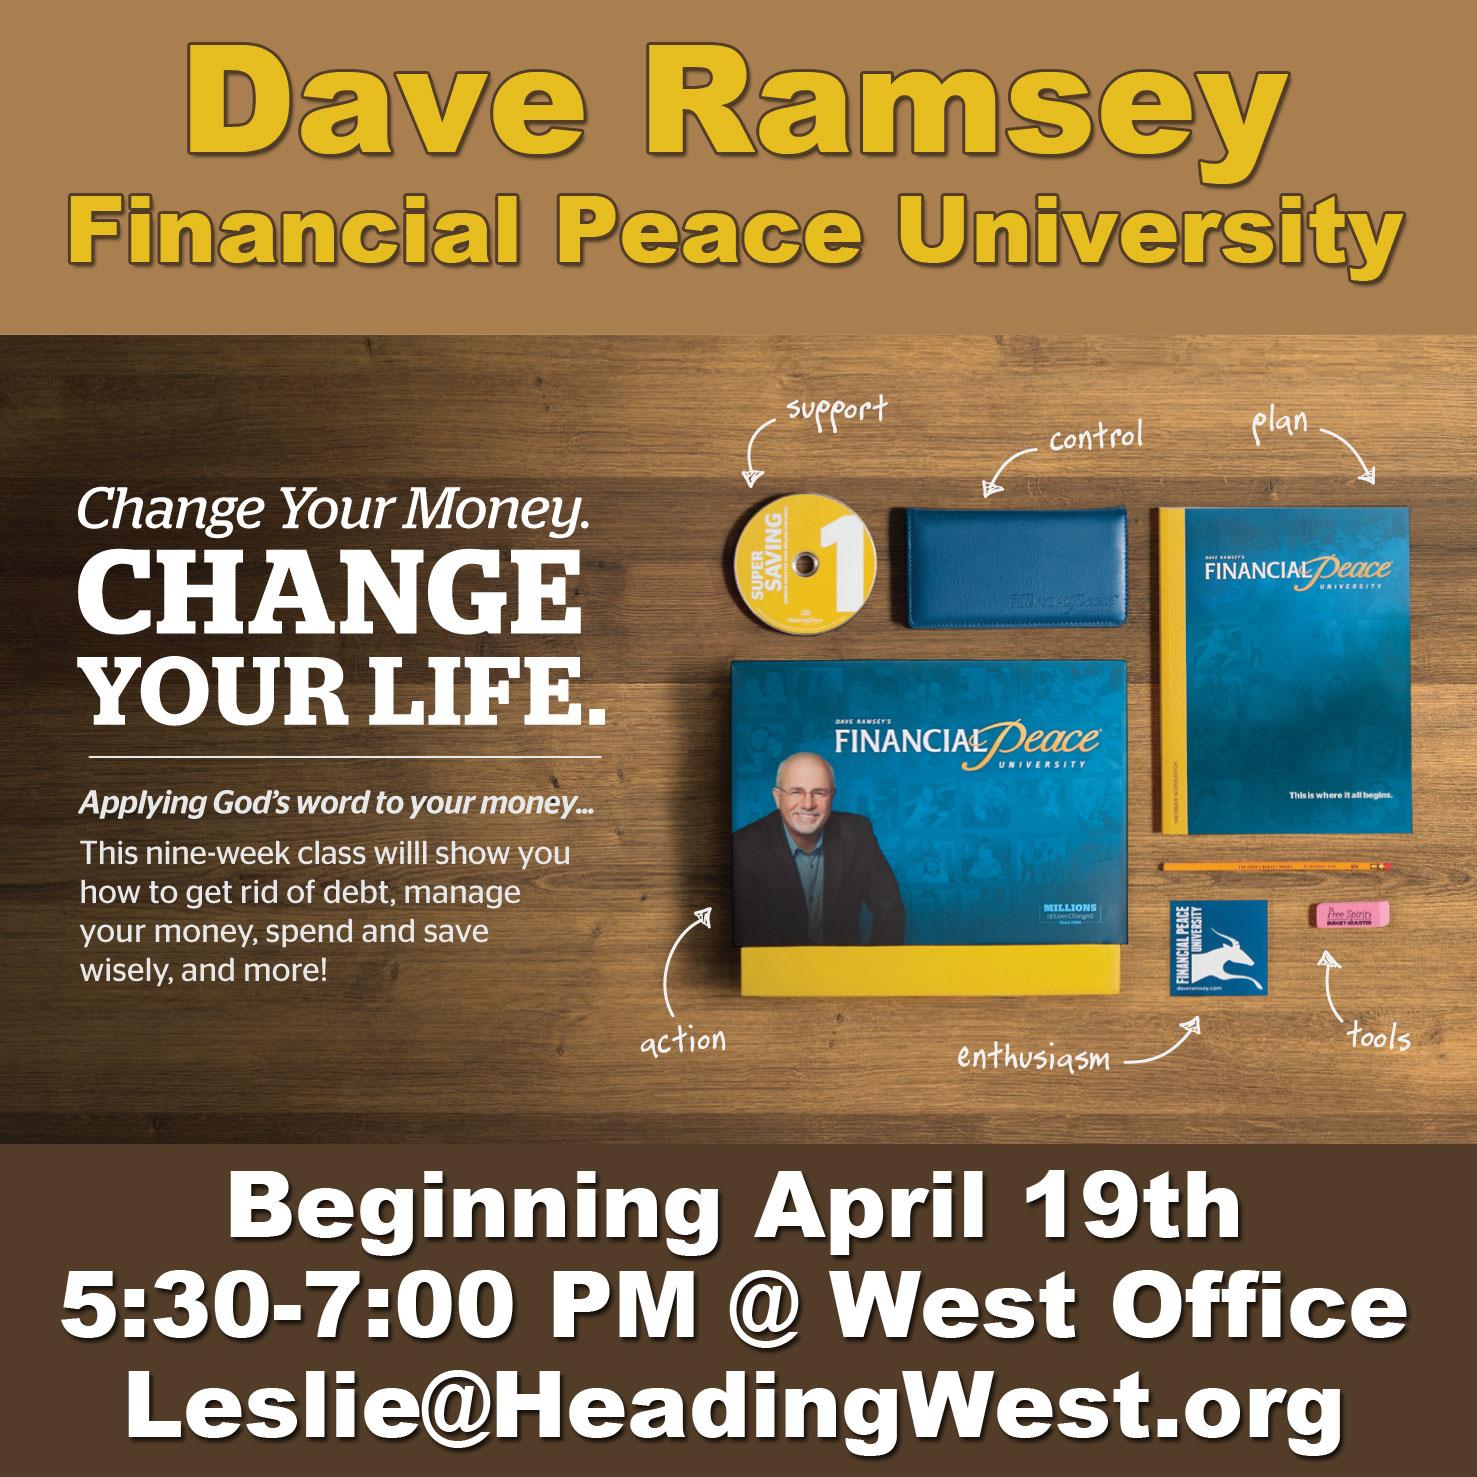 Dave Ramsey – Financial Peace University